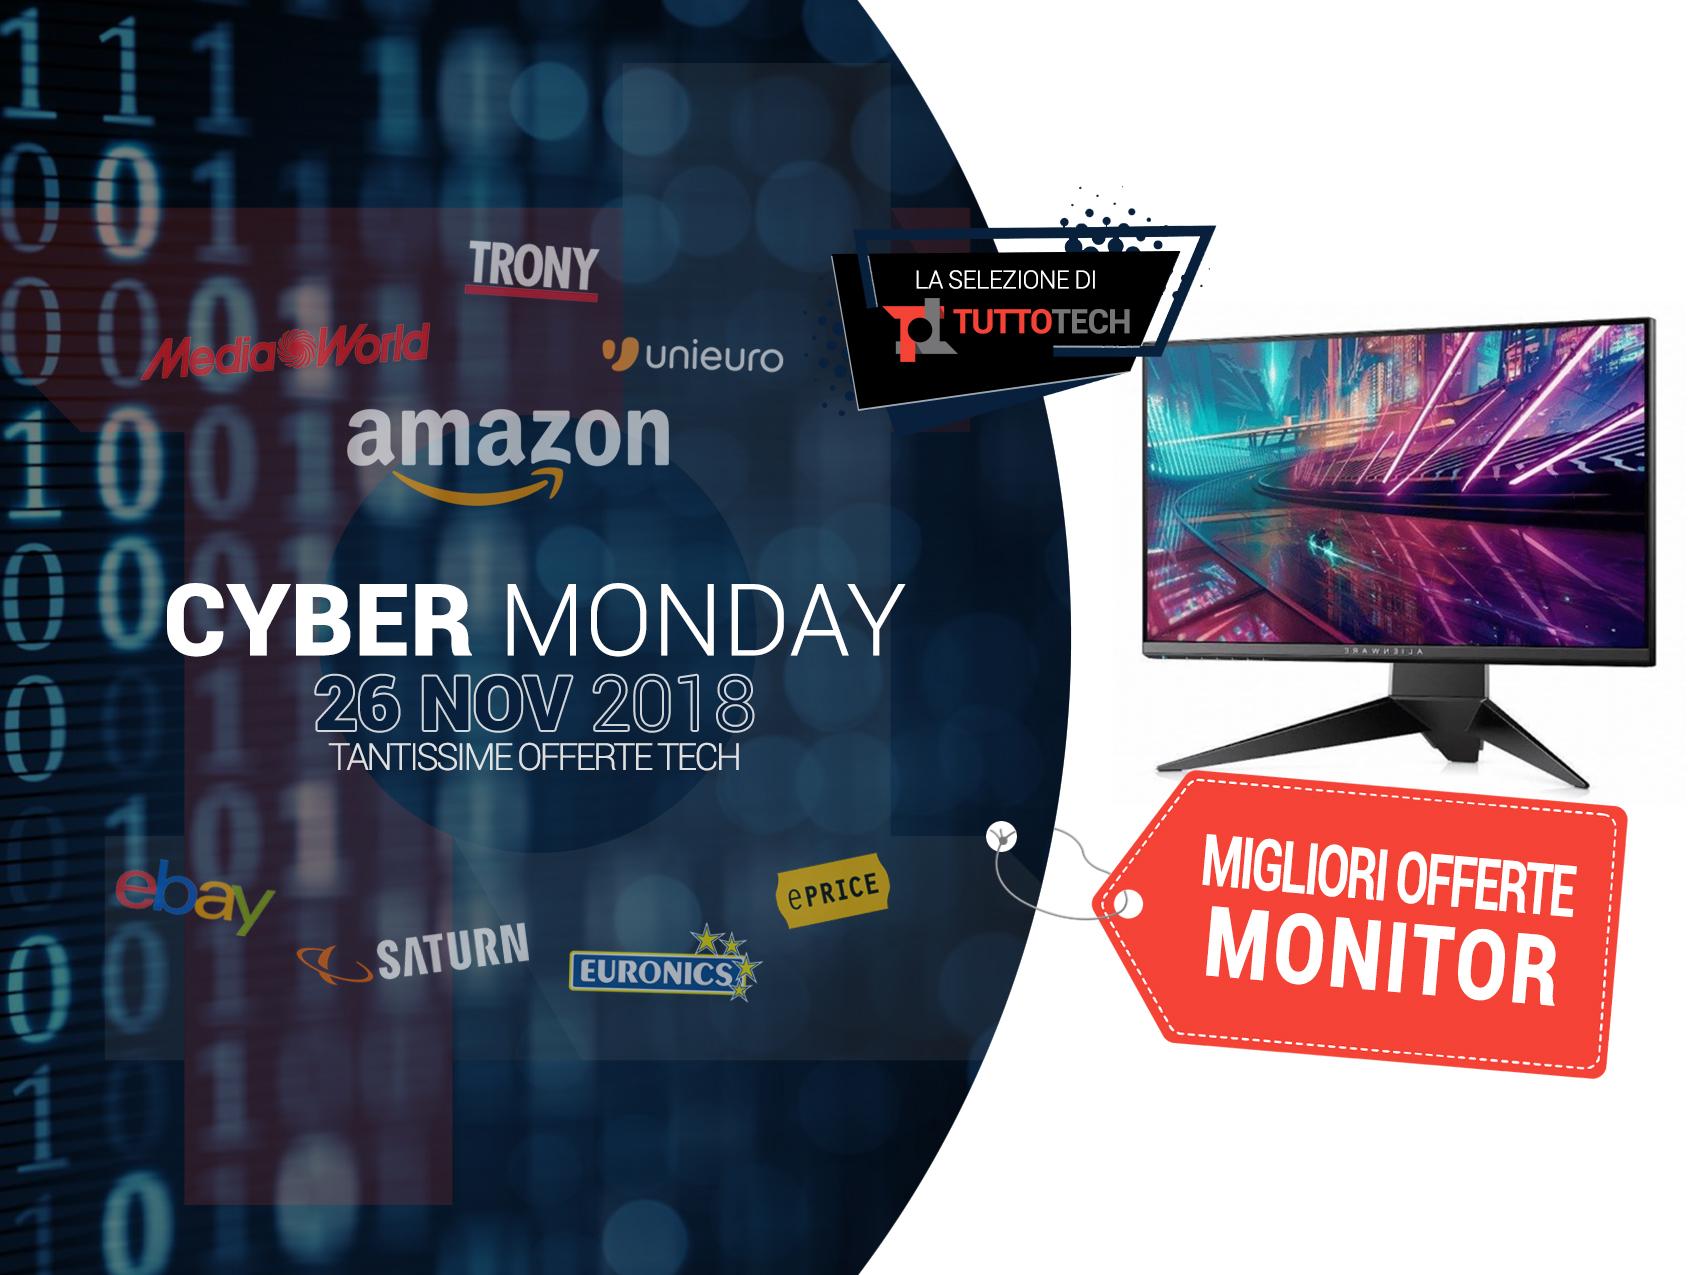 3f0d7af12a853d Monitor Cyber Monday: le migliori offerte in tempo reale   TuttoTech.net